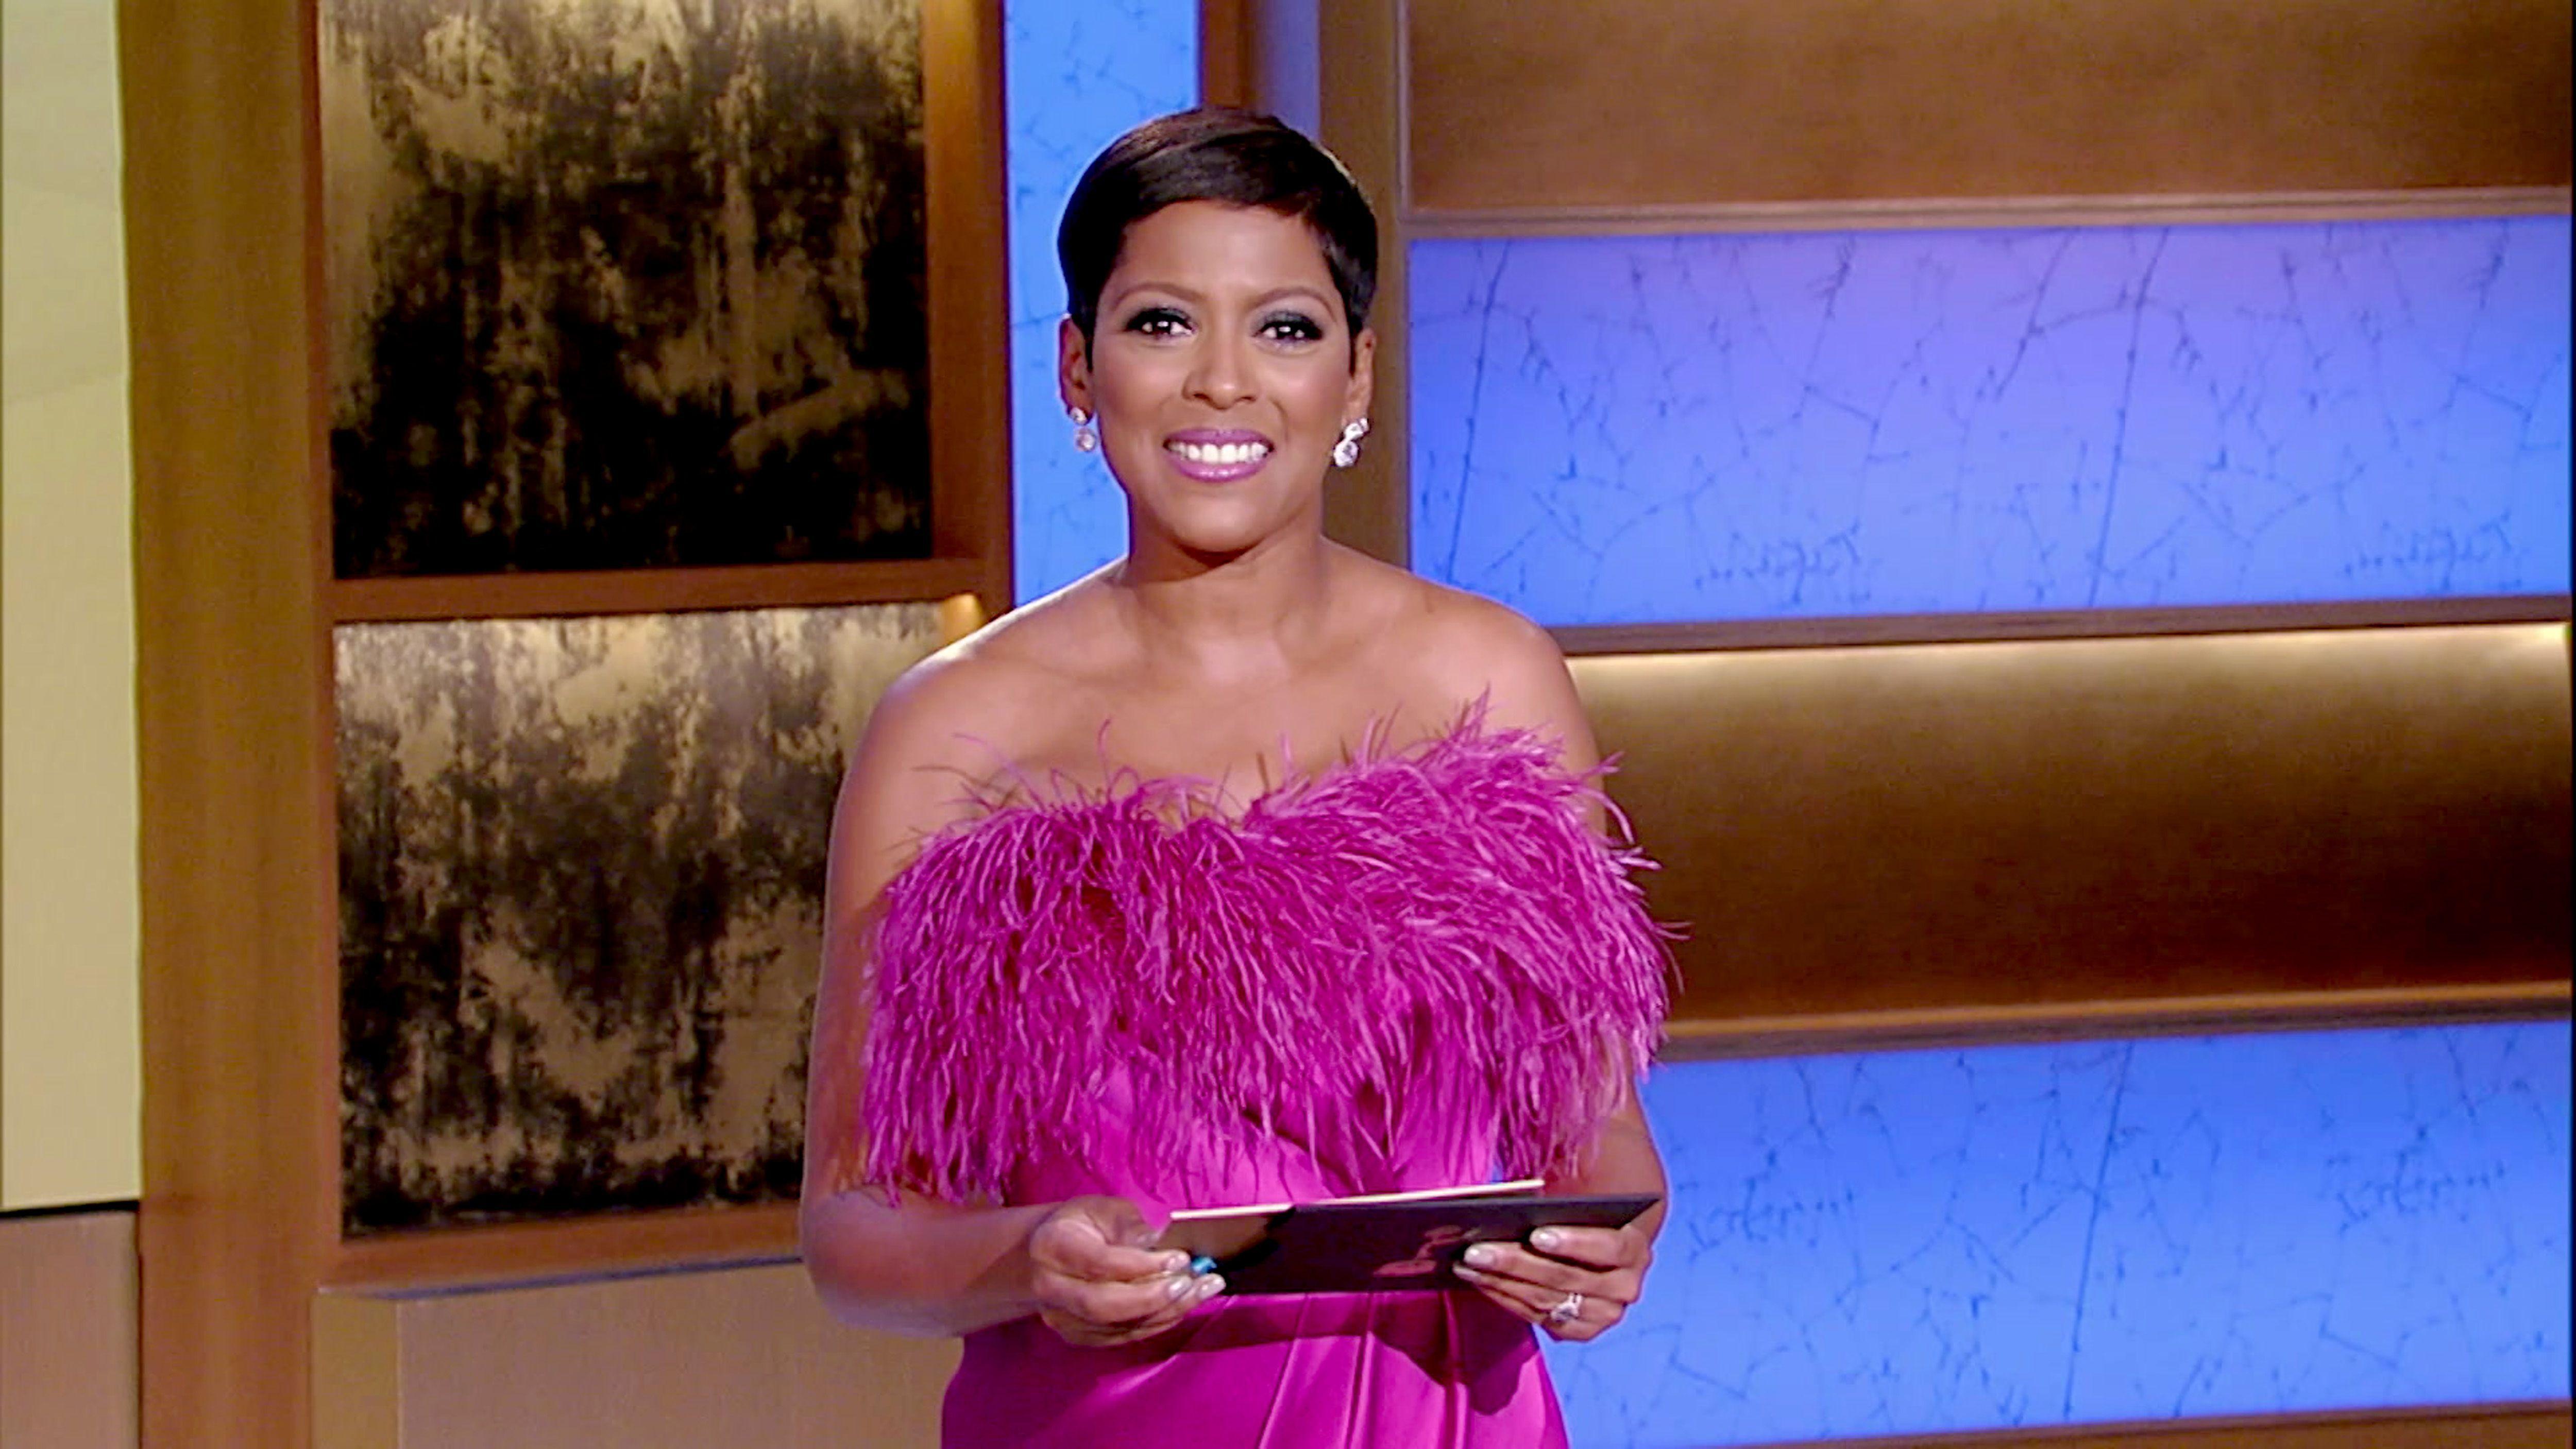 48th Annual Daytime Emmy Awards